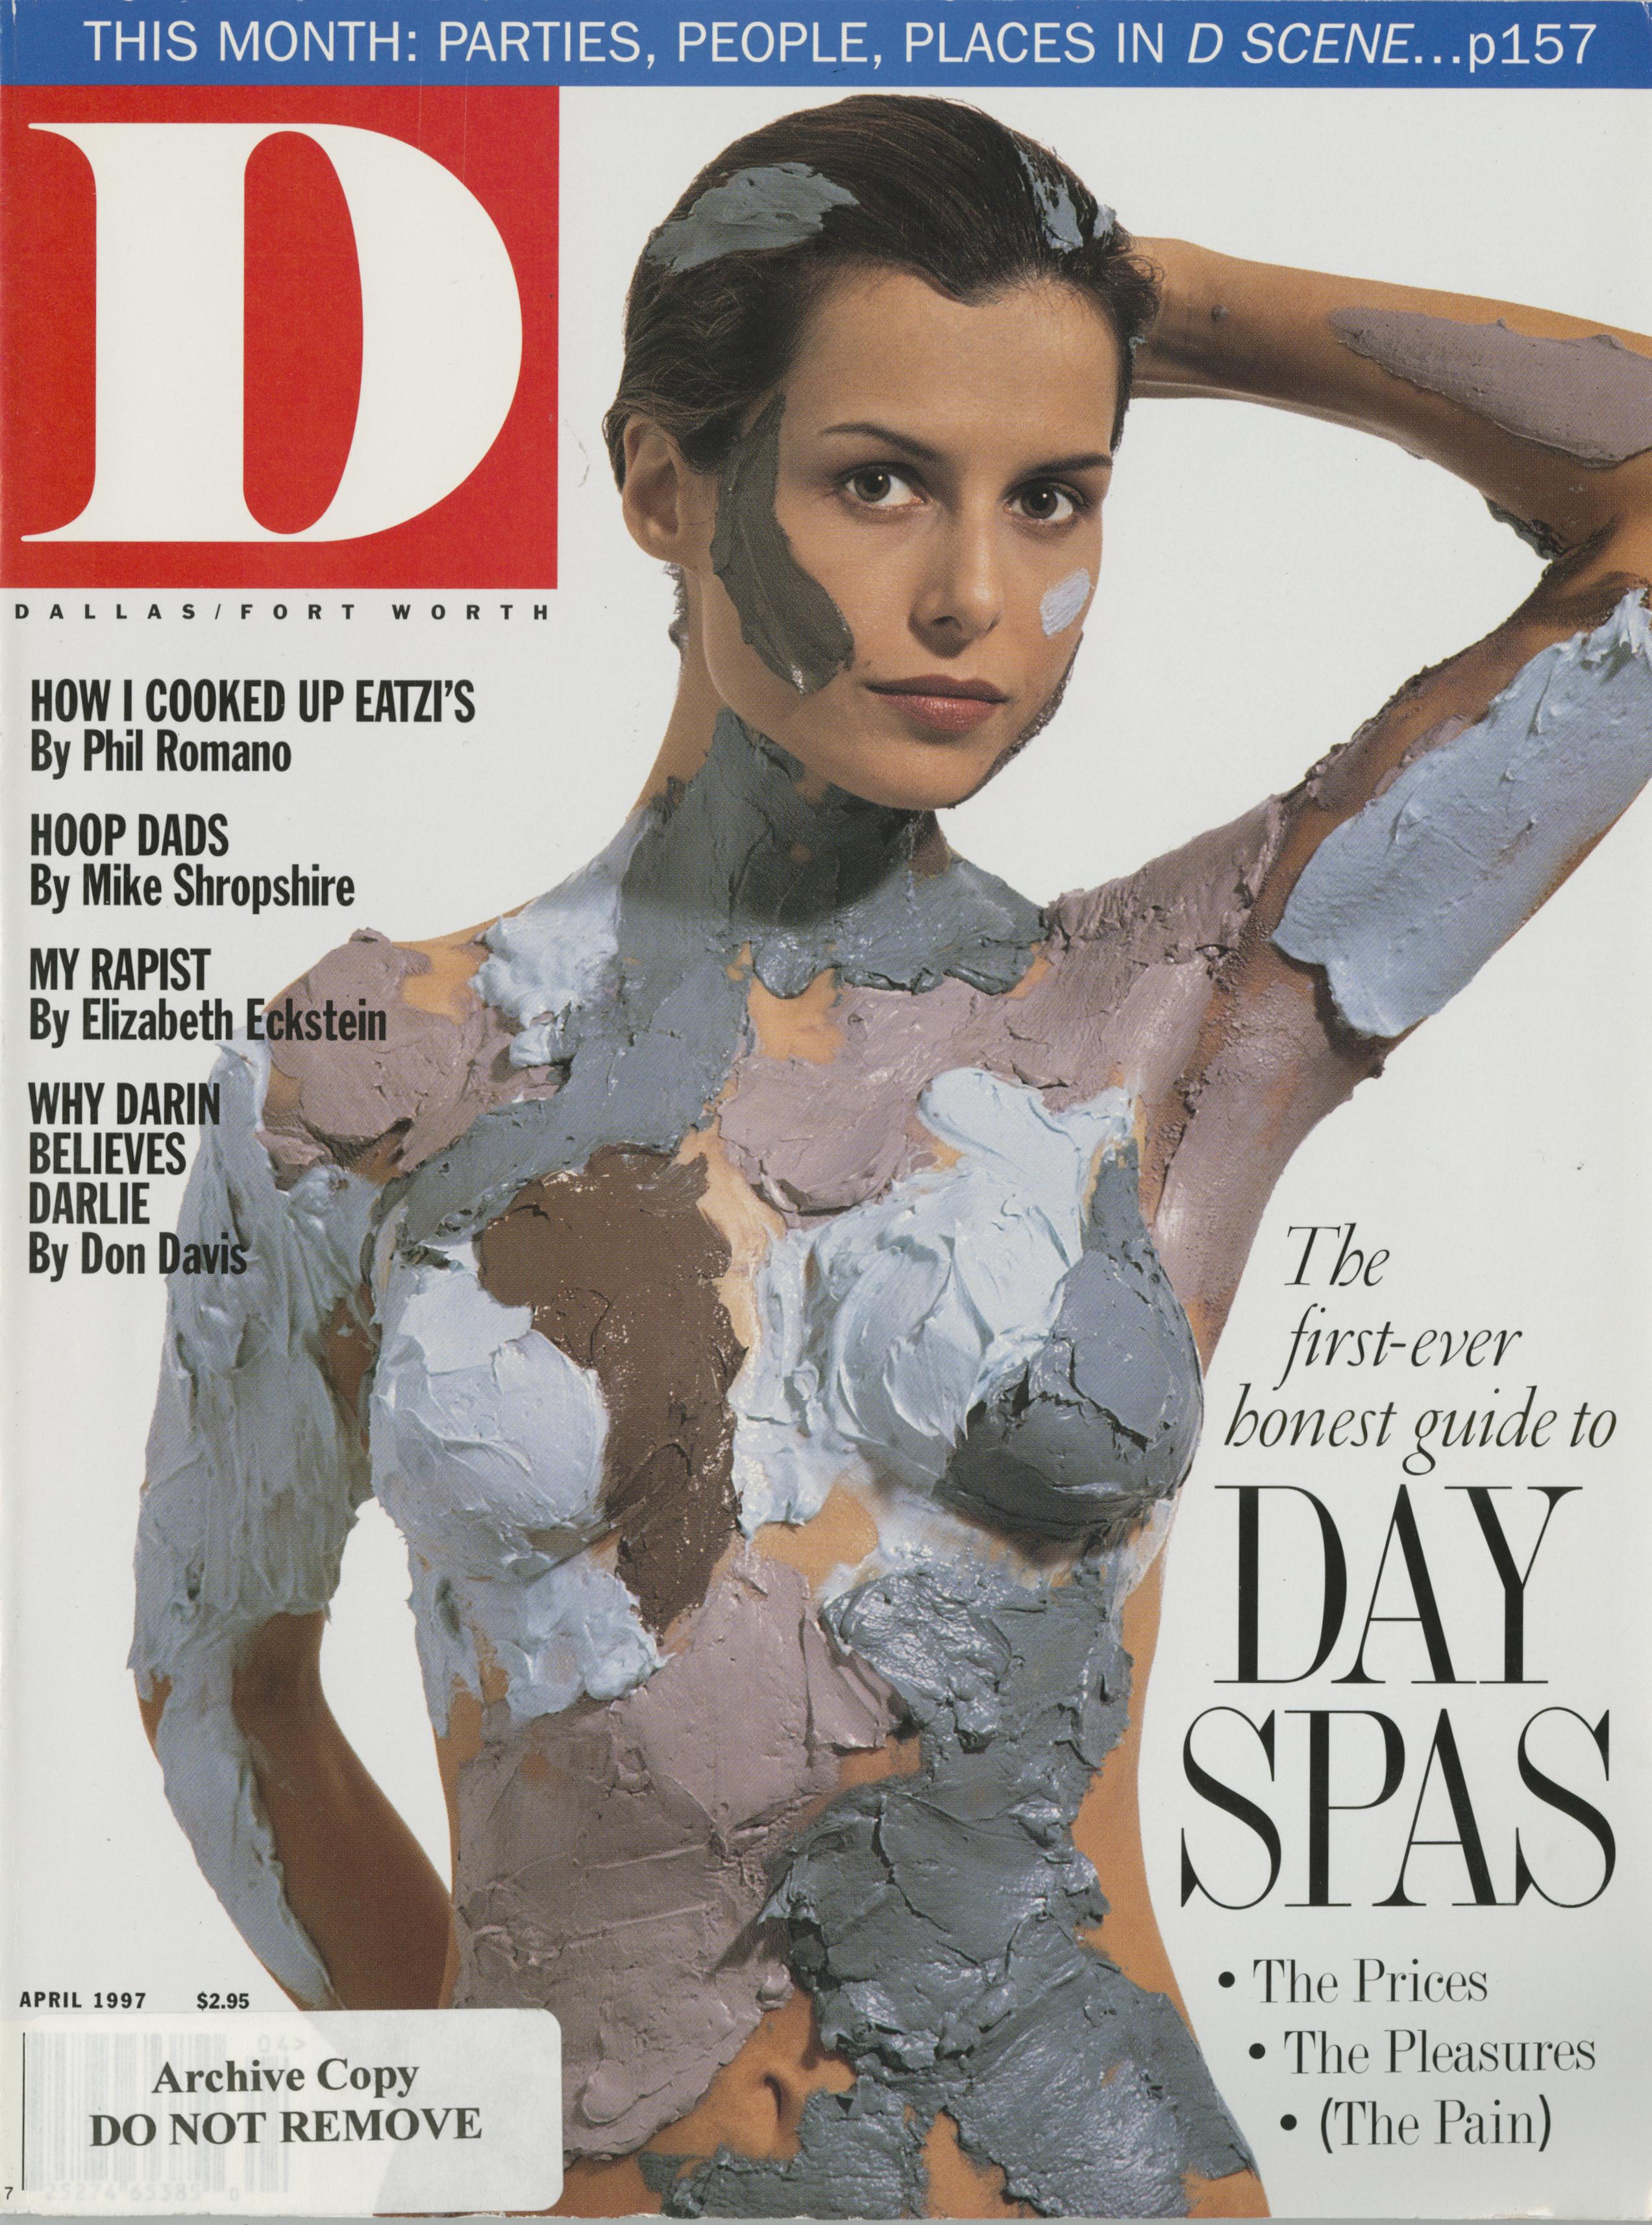 April 1997 cover